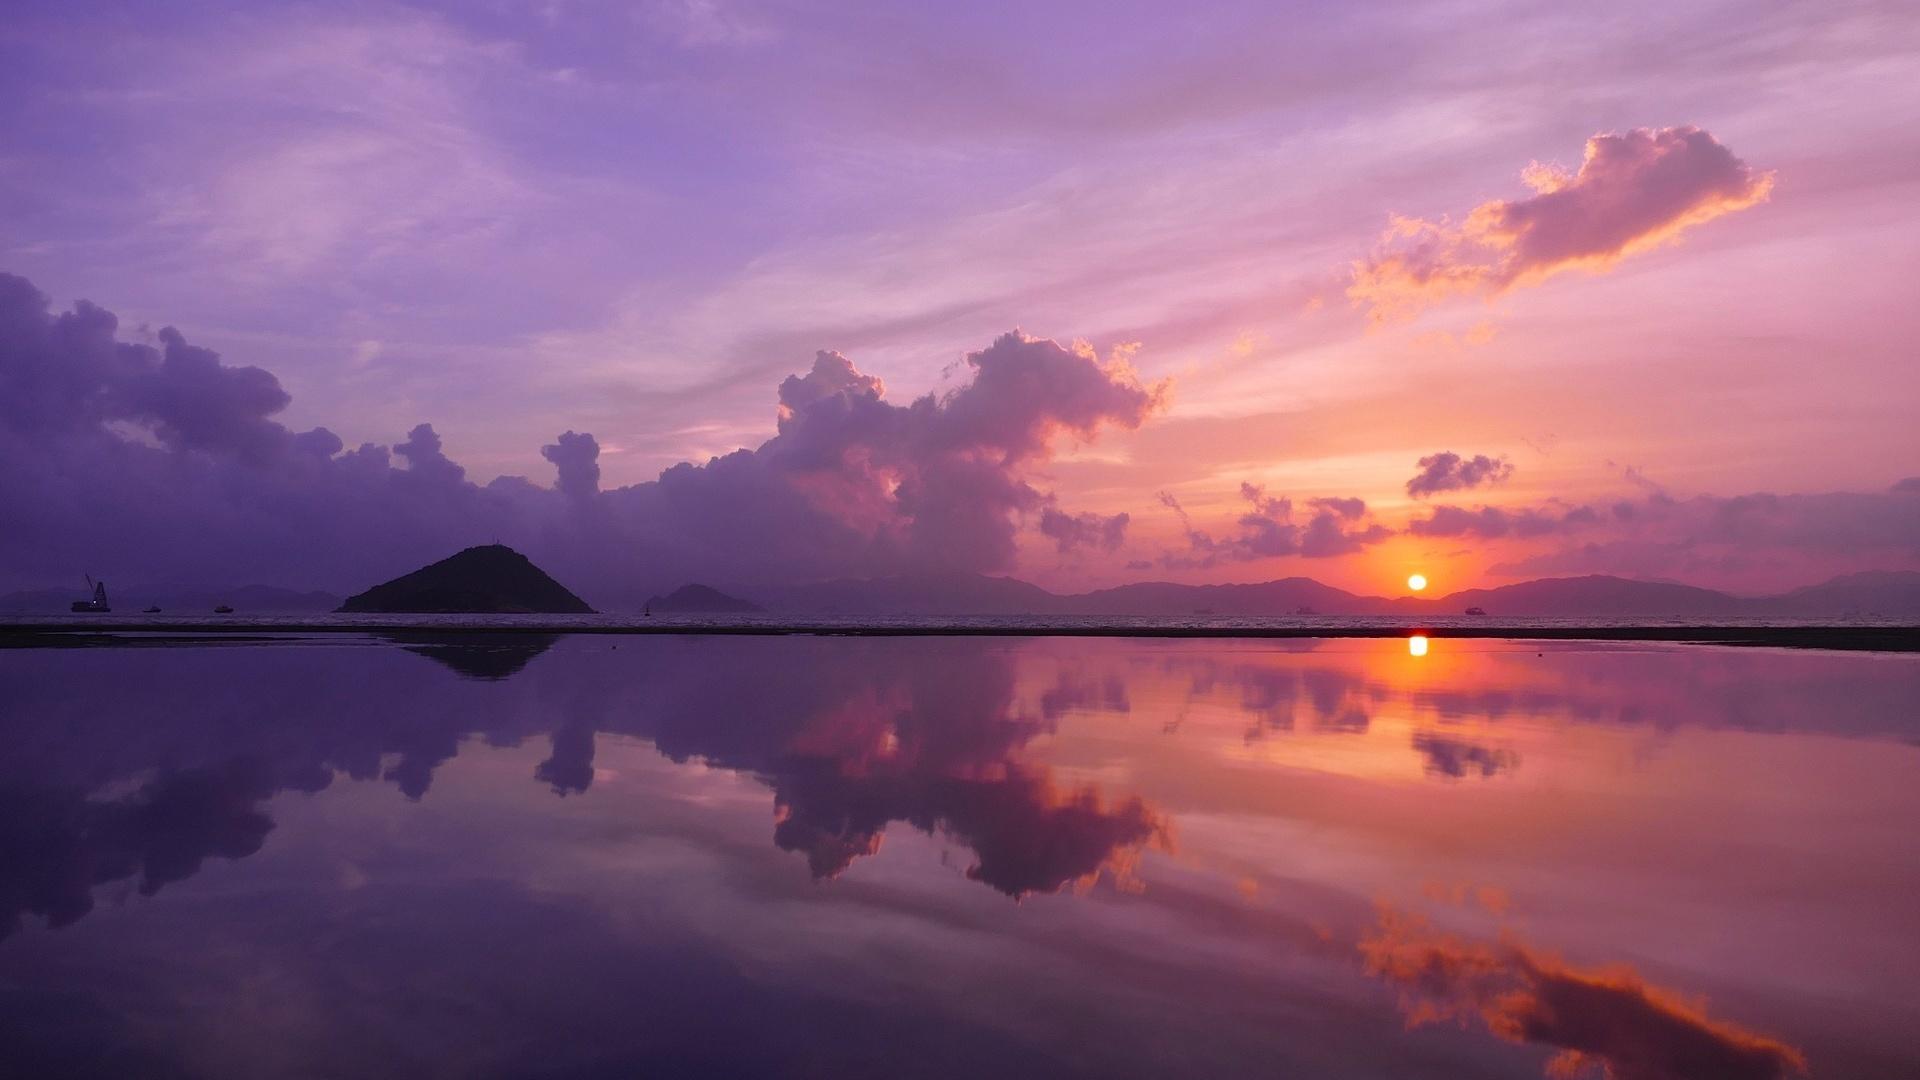 Sunset 1080p wallpaper